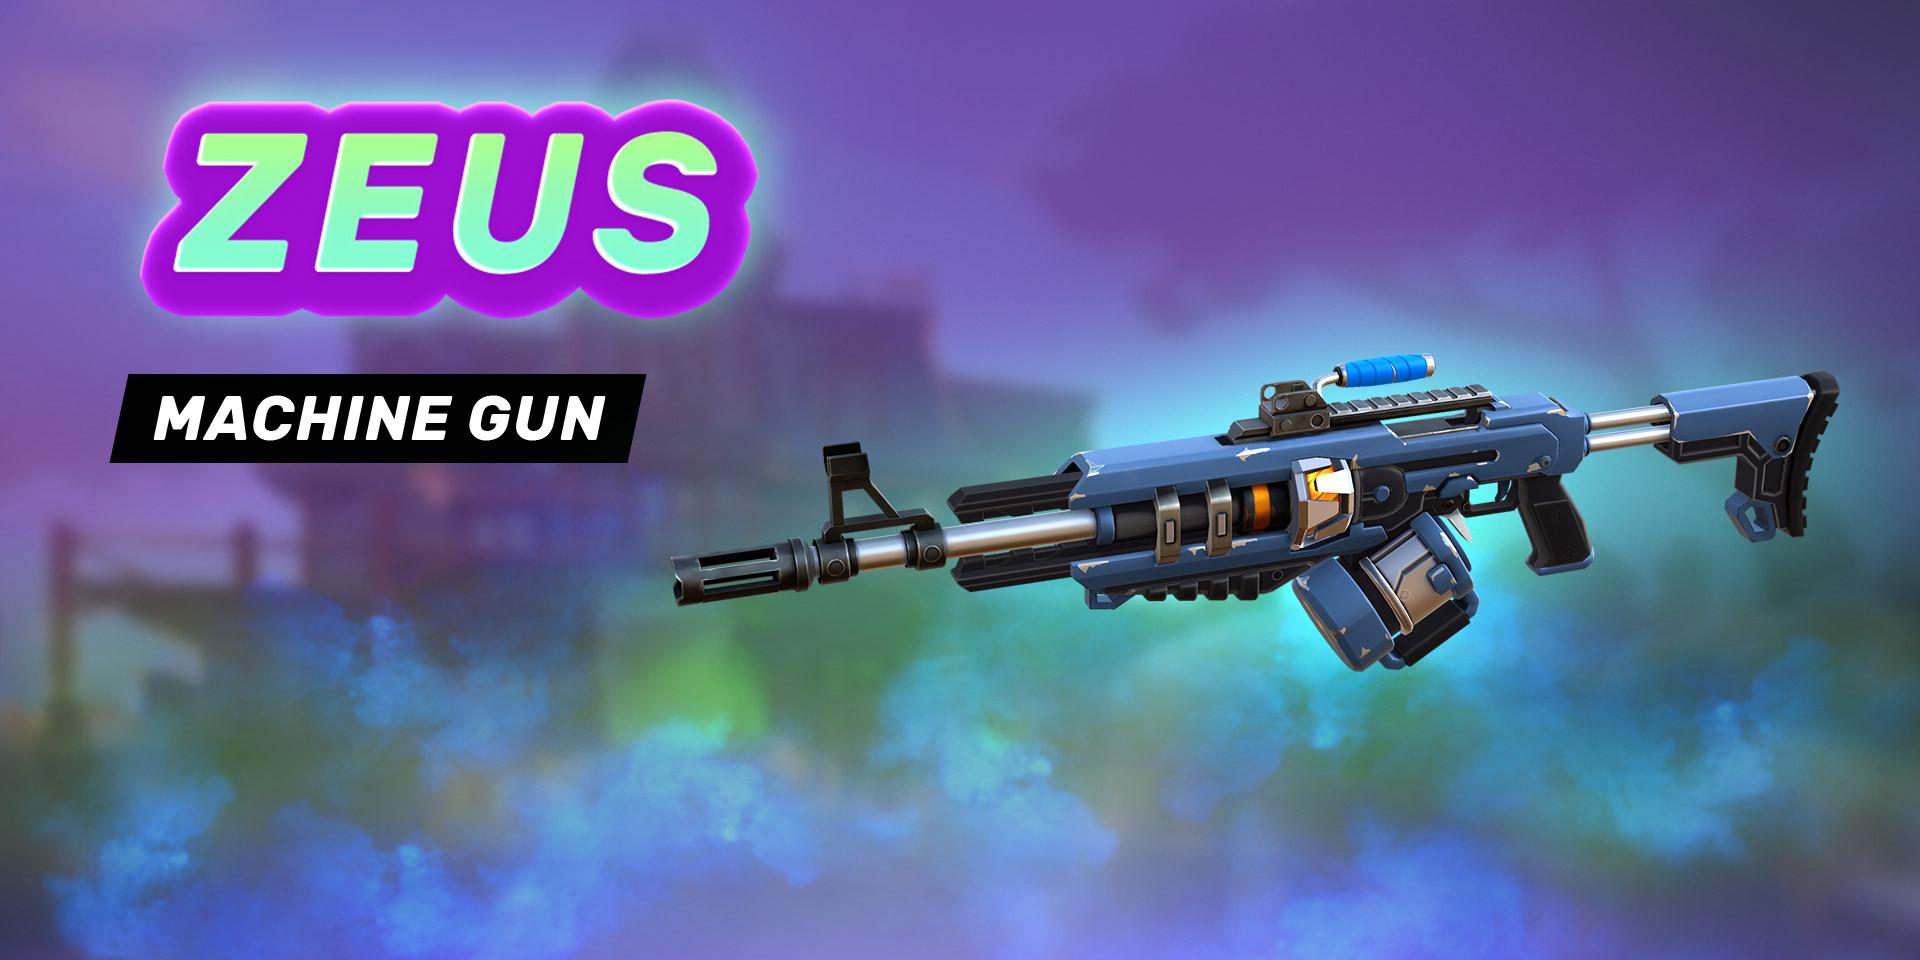 gunsopedia-zeus-4n00FozkcH